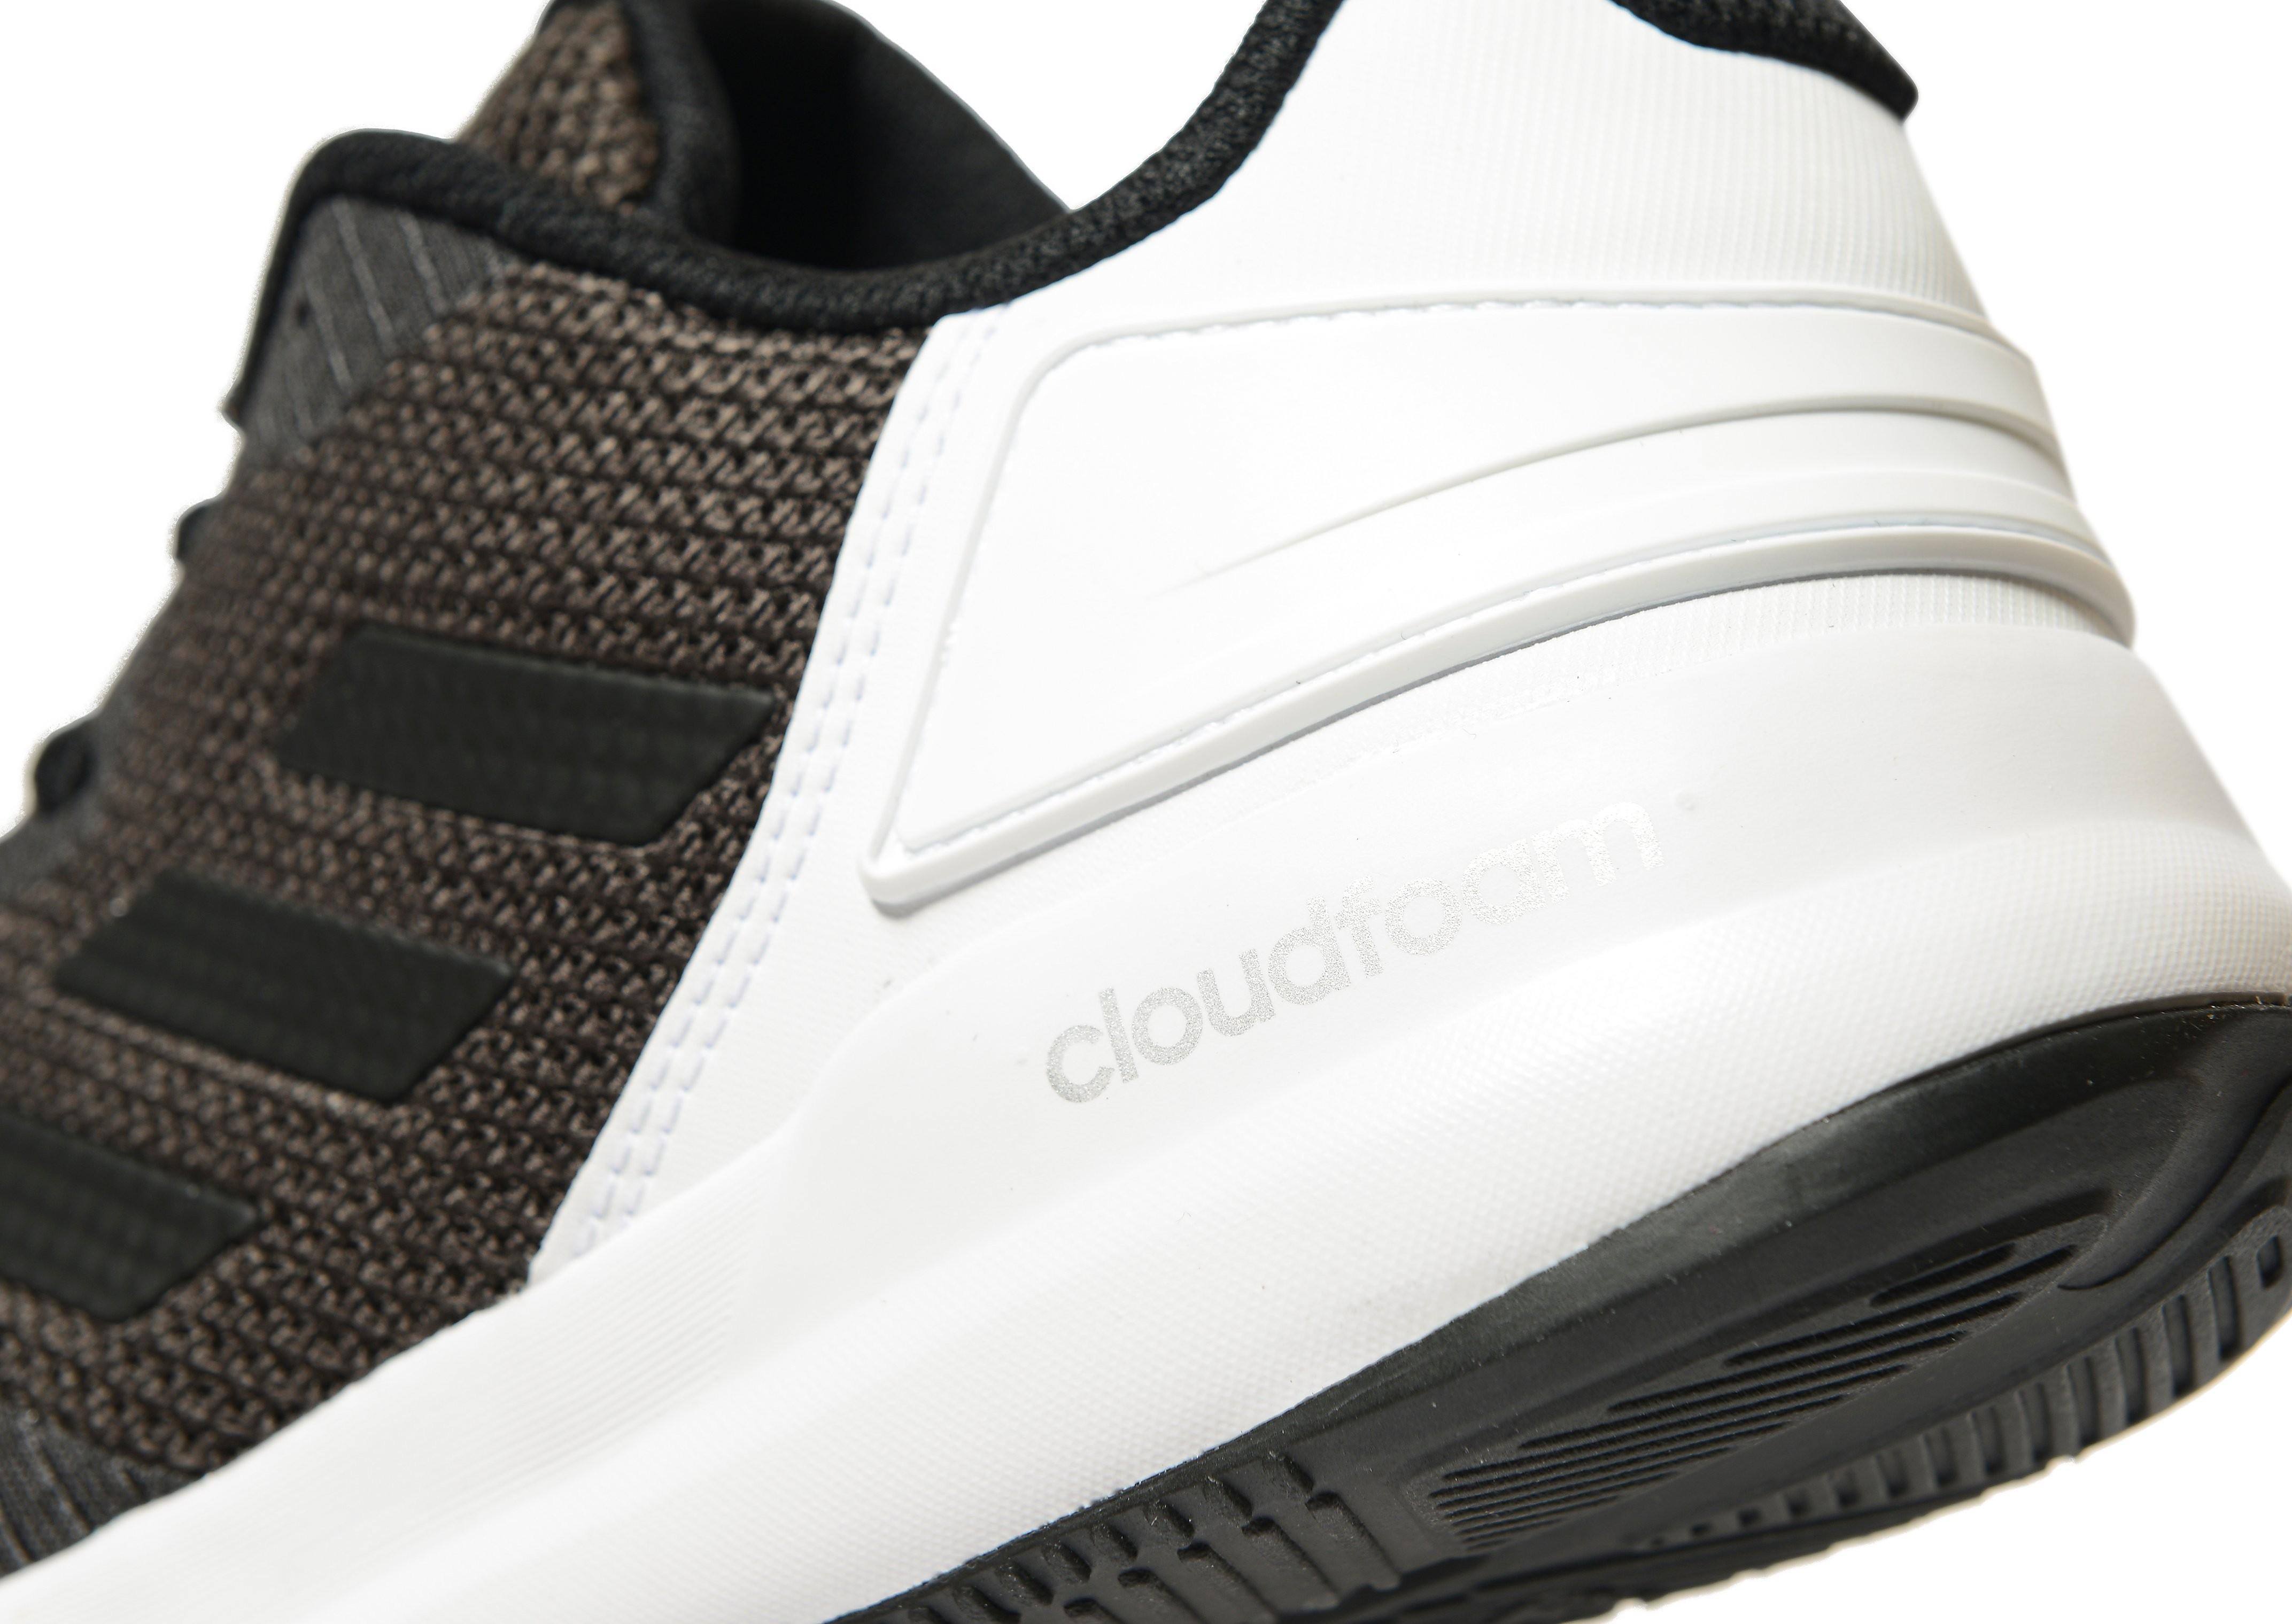 adidas CRAZYTRAIN 2.0 Cloudfoam Shoes